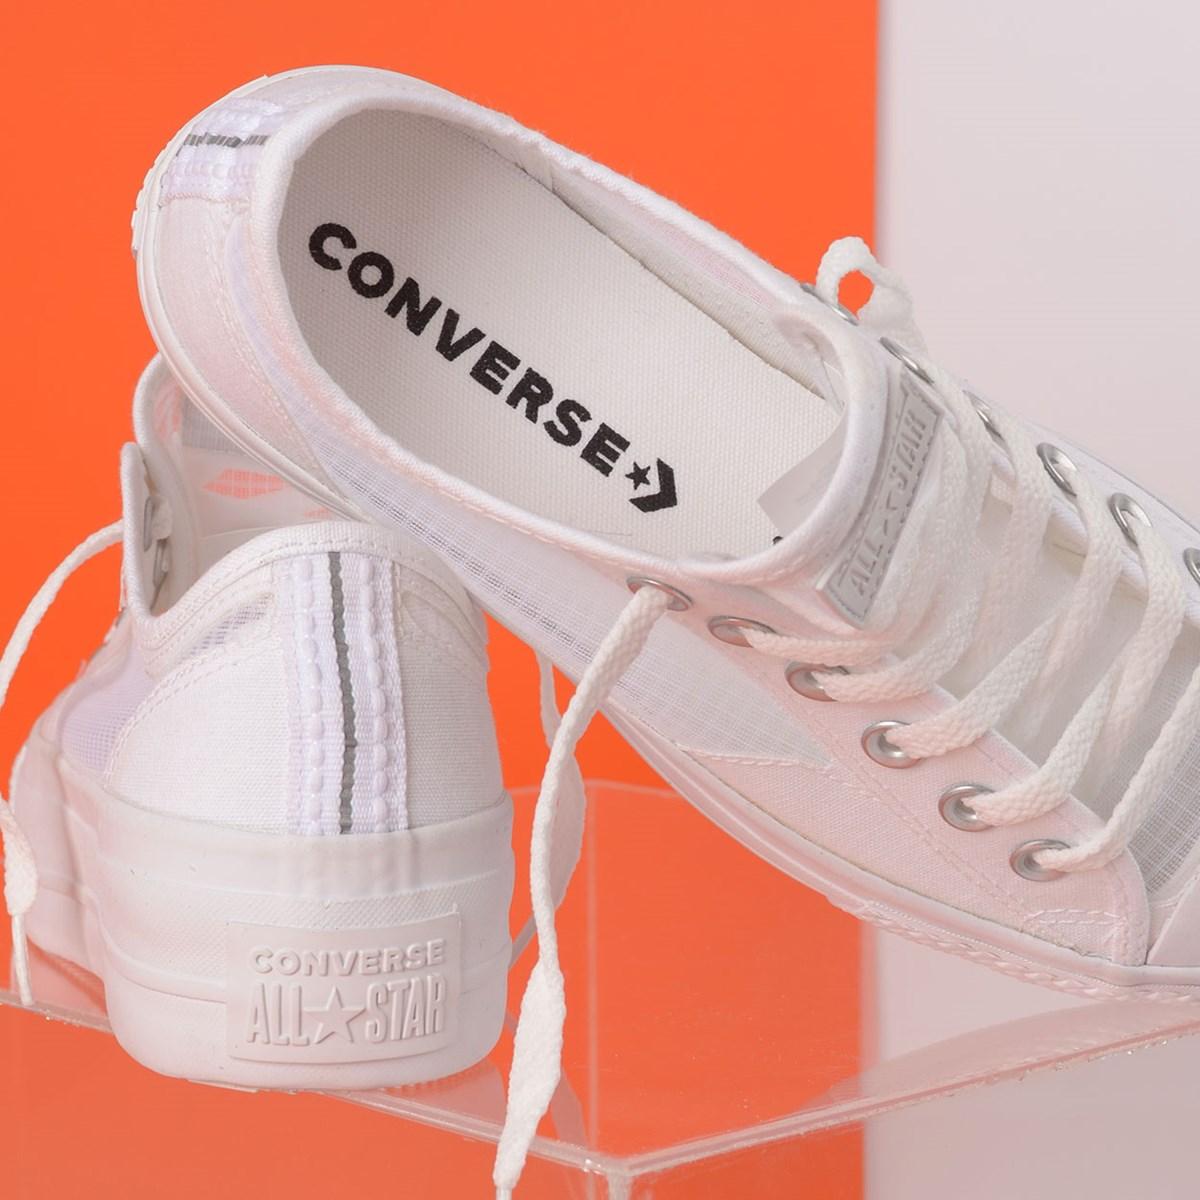 Tênis Converse Chuck Taylor All Star Breathe Platform Lift Ox Branco Branco CT14900001